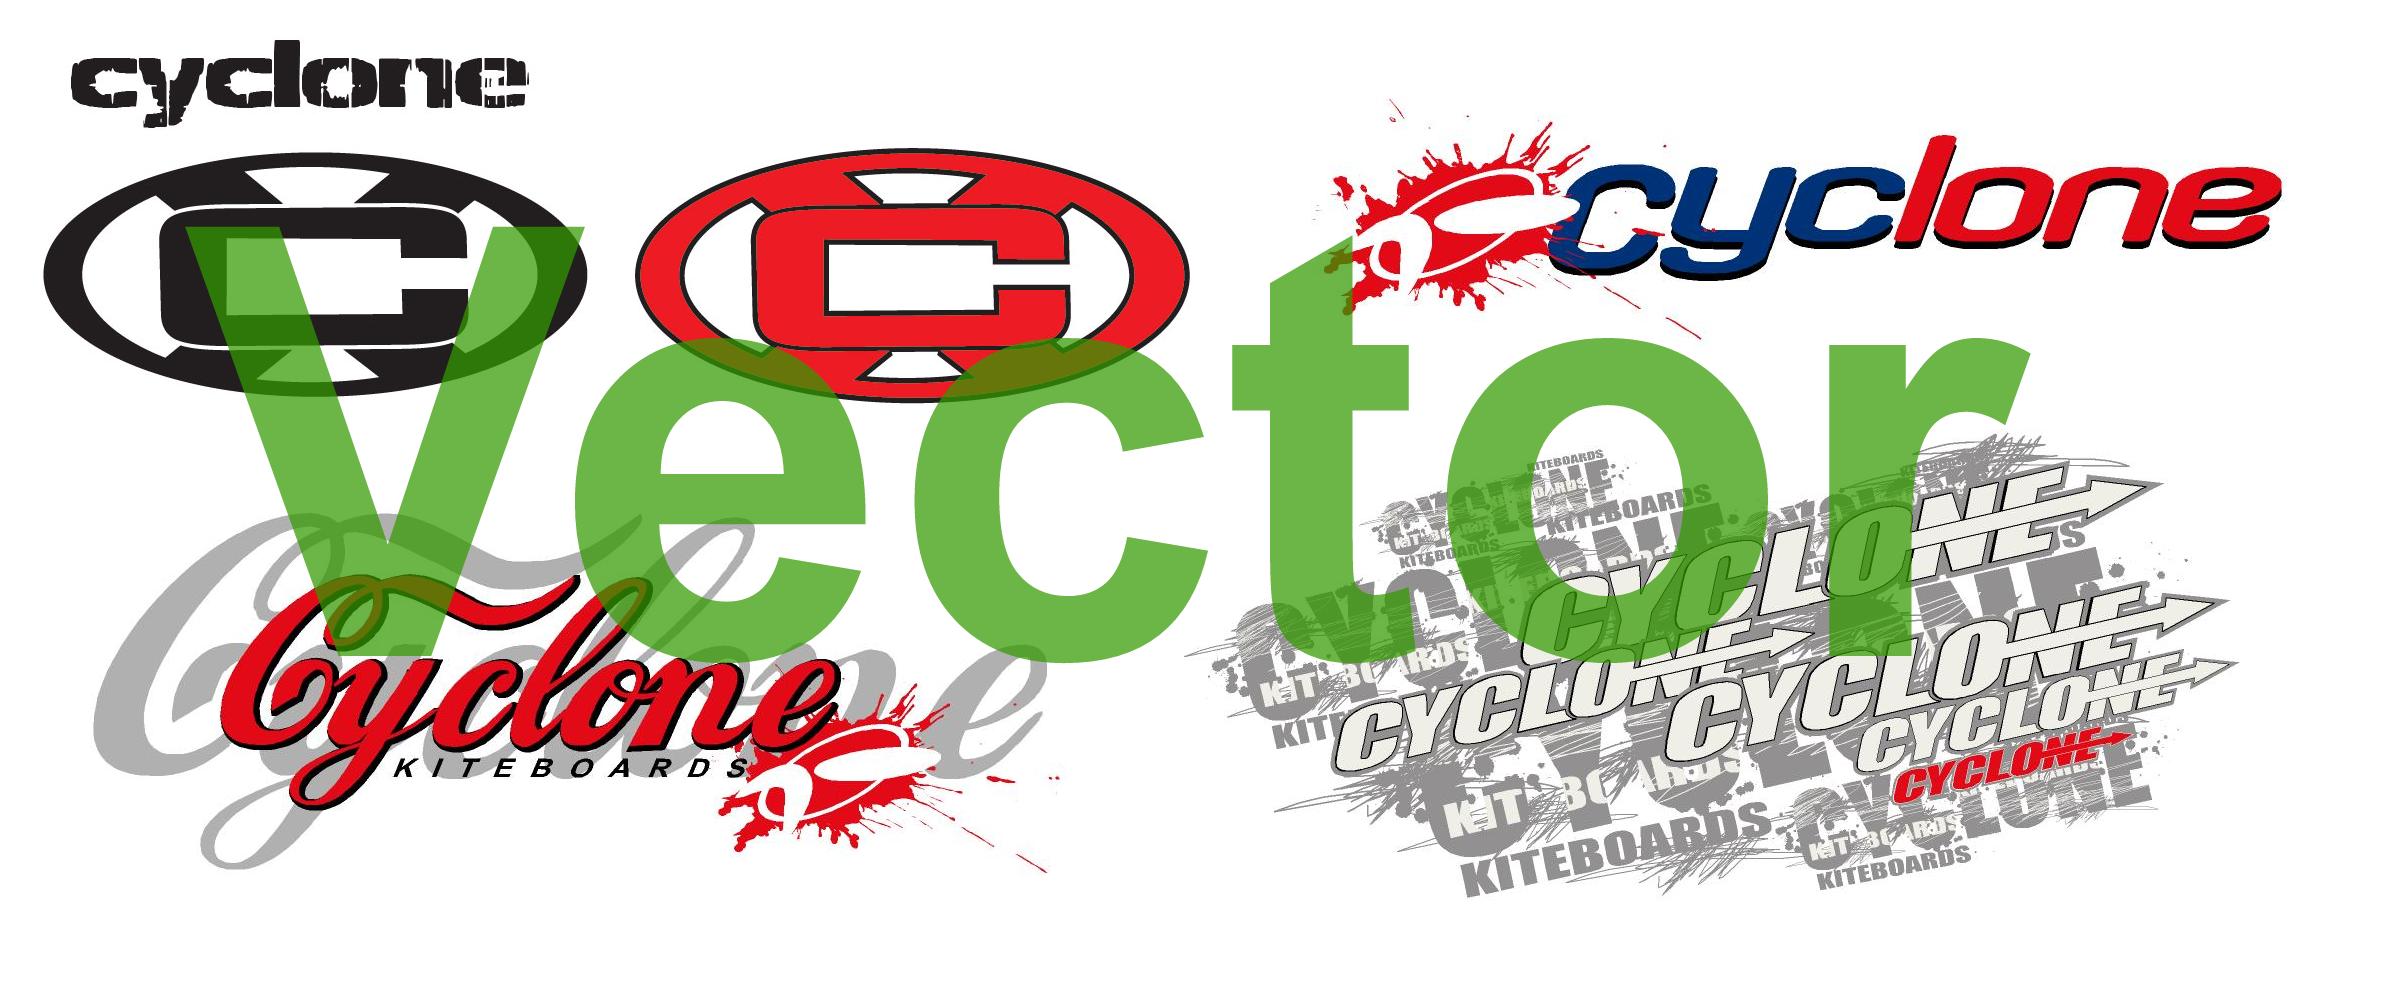 2008 cyclone logos vector by angrykoaladownunder on deviantart